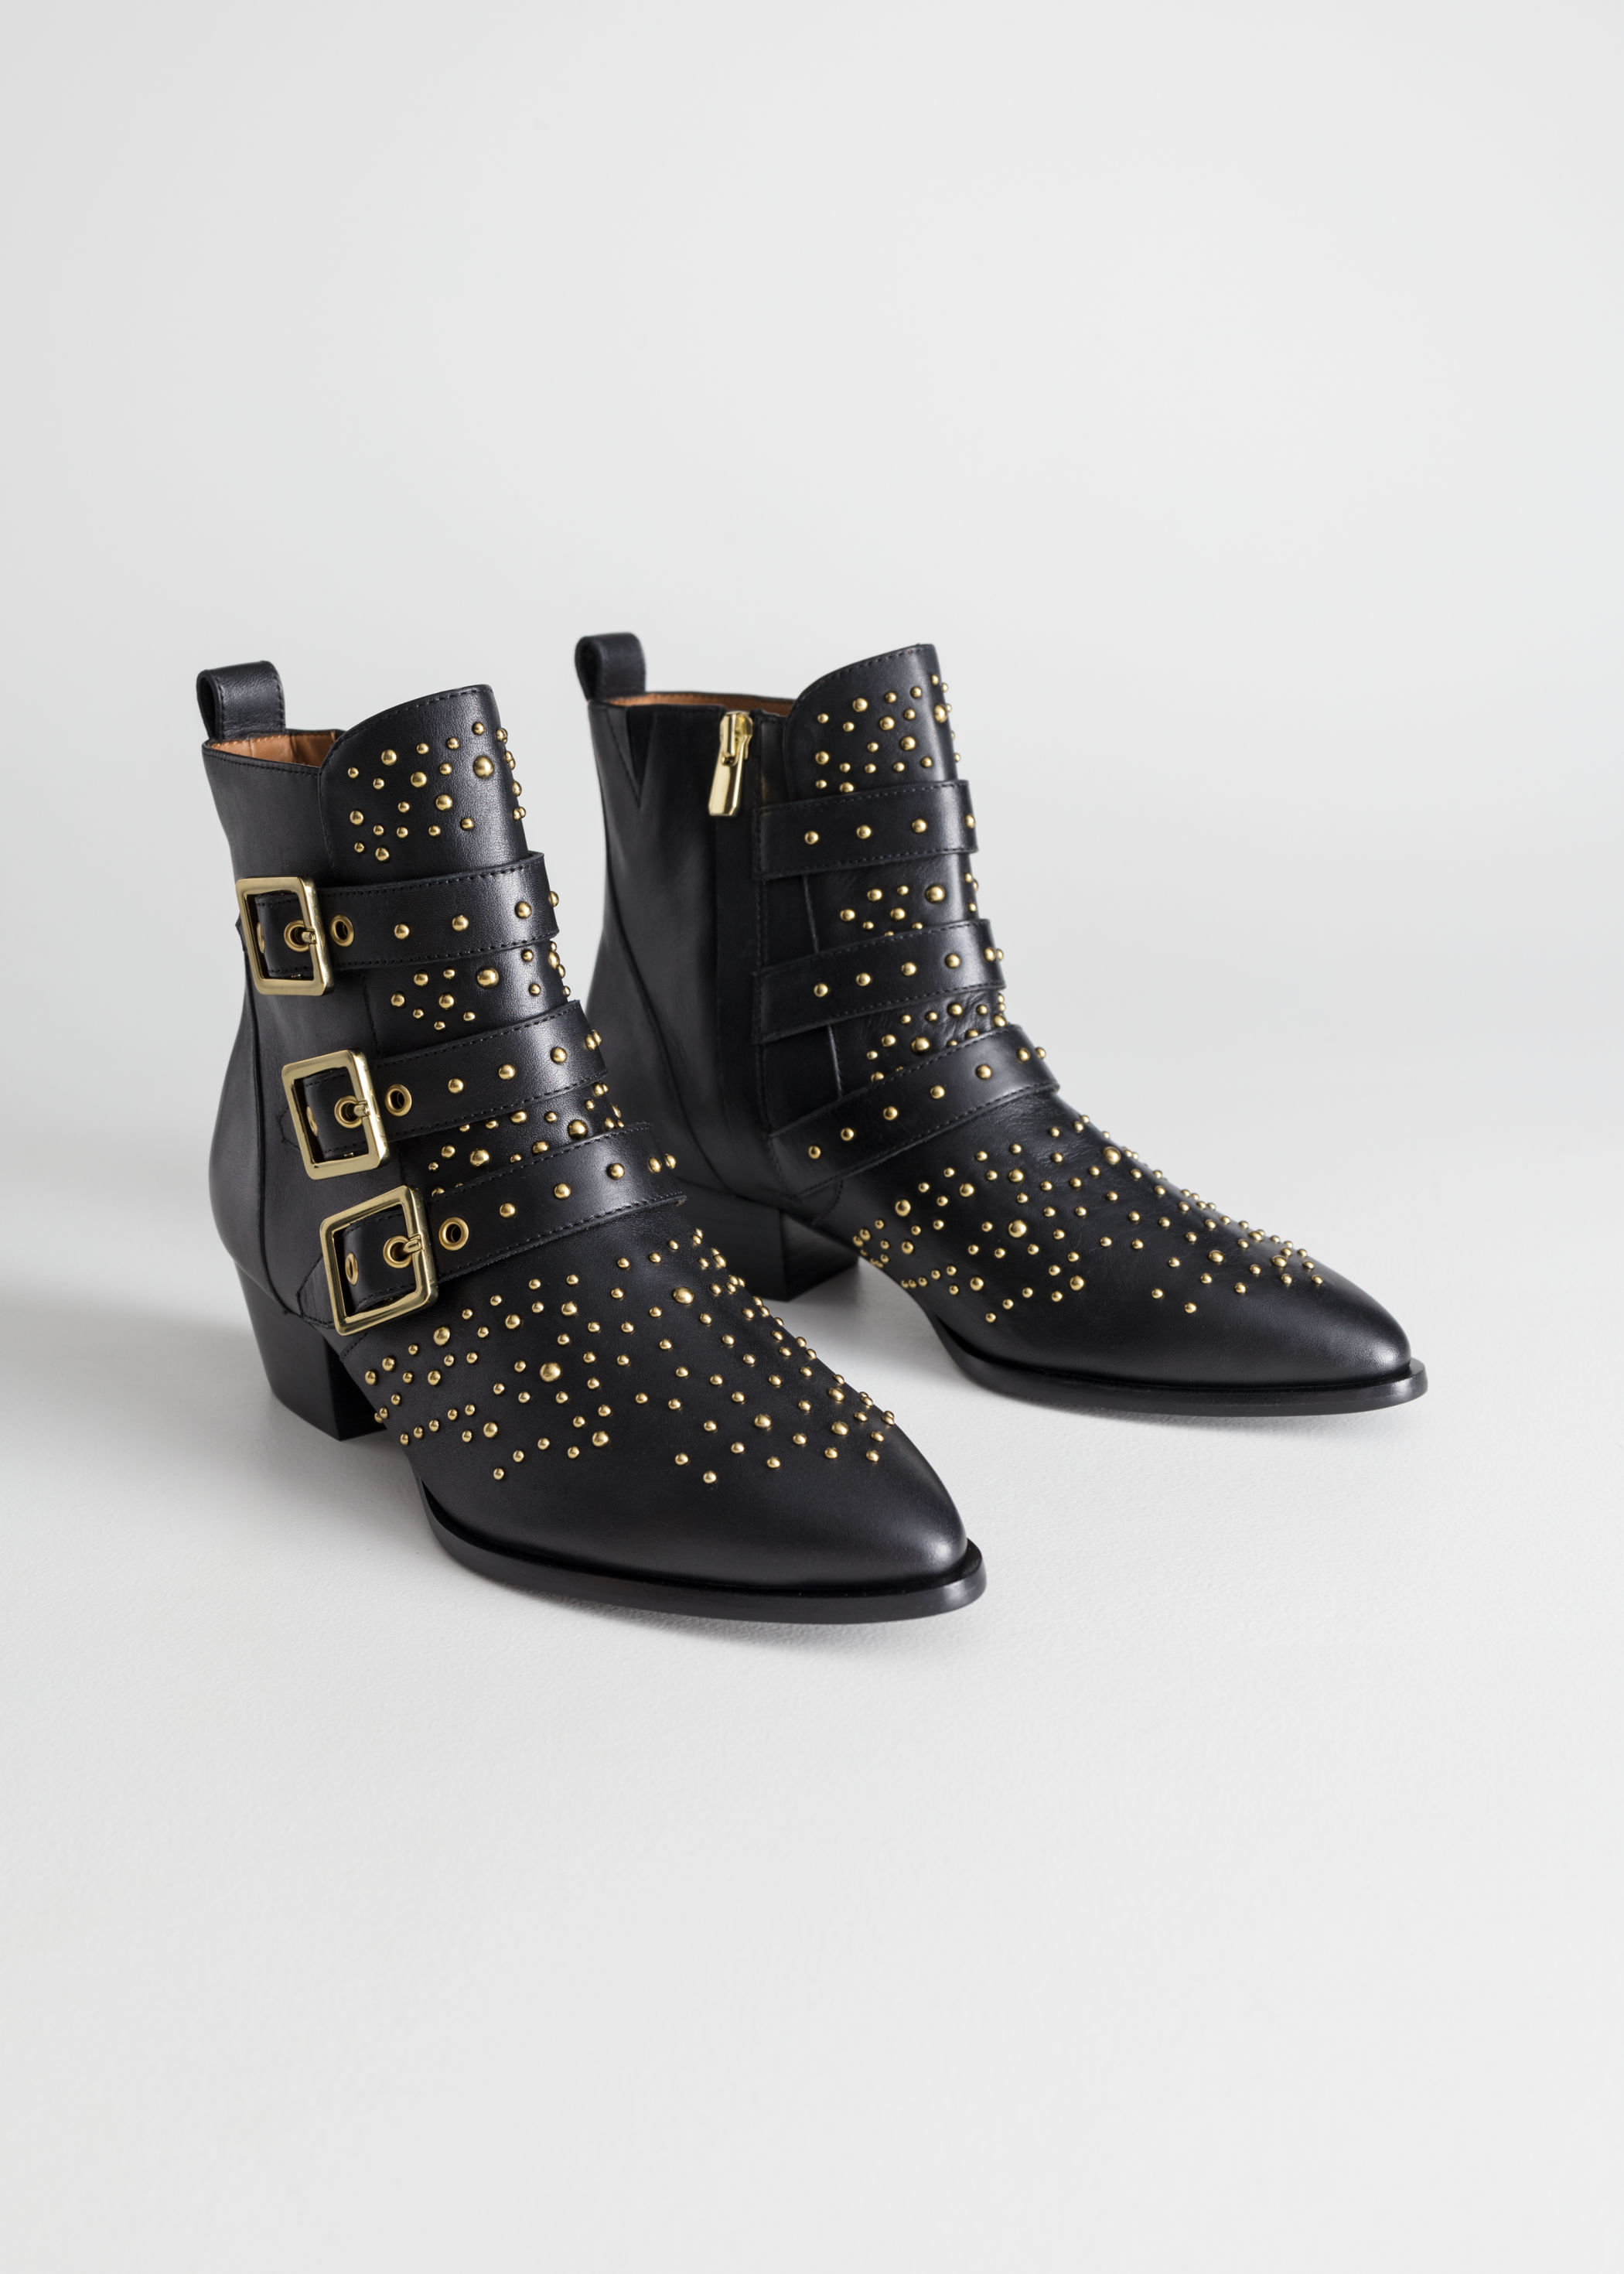 Their Dupes #4 Chloe Susanna Boots